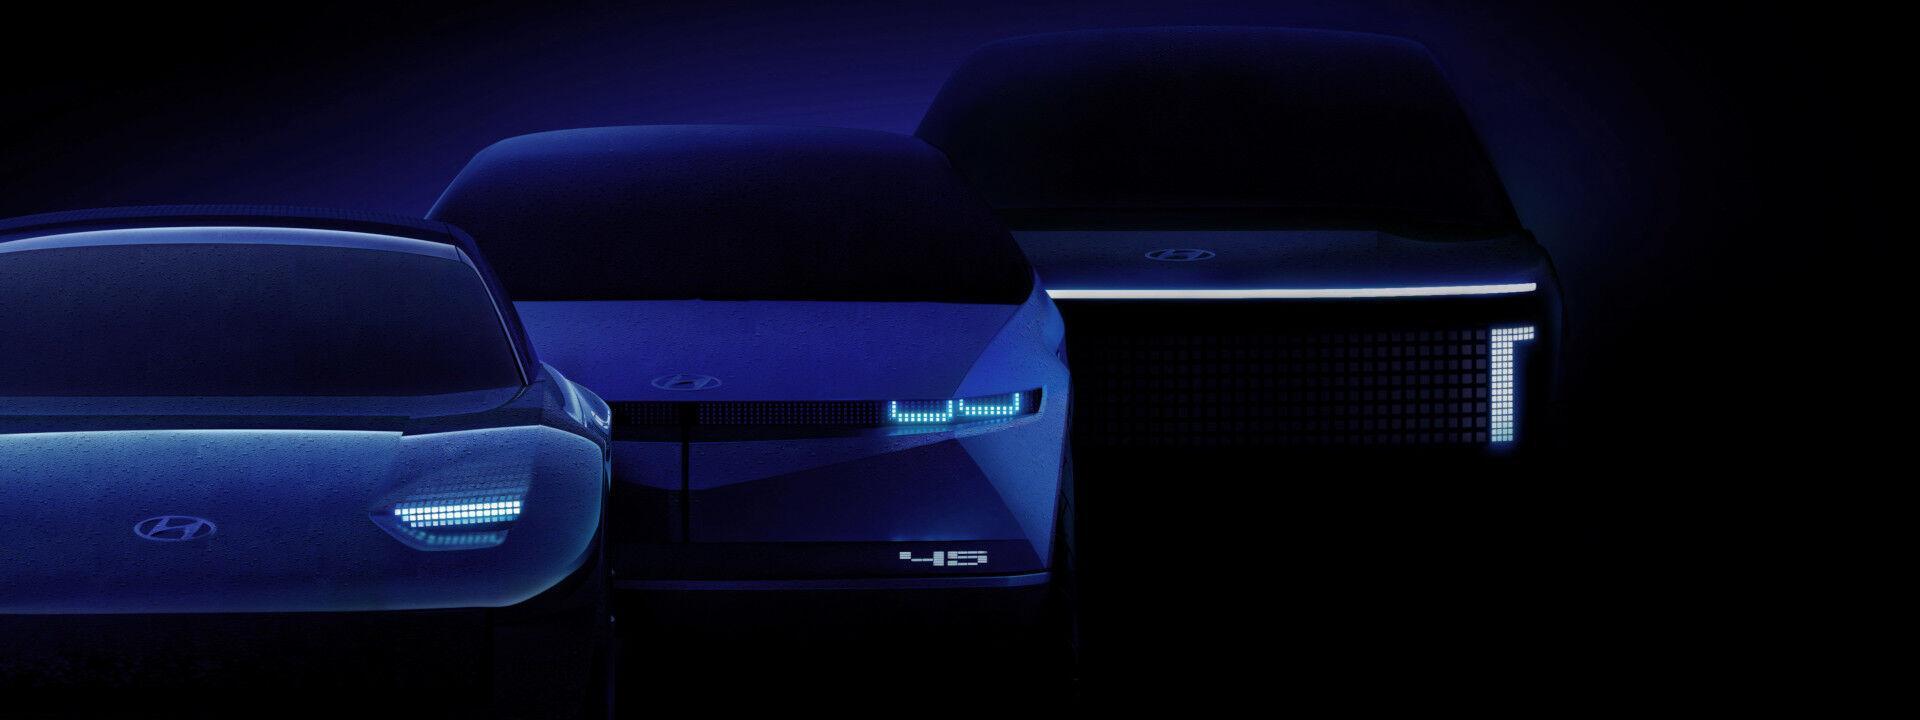 Hyundai Ioniq sub brand